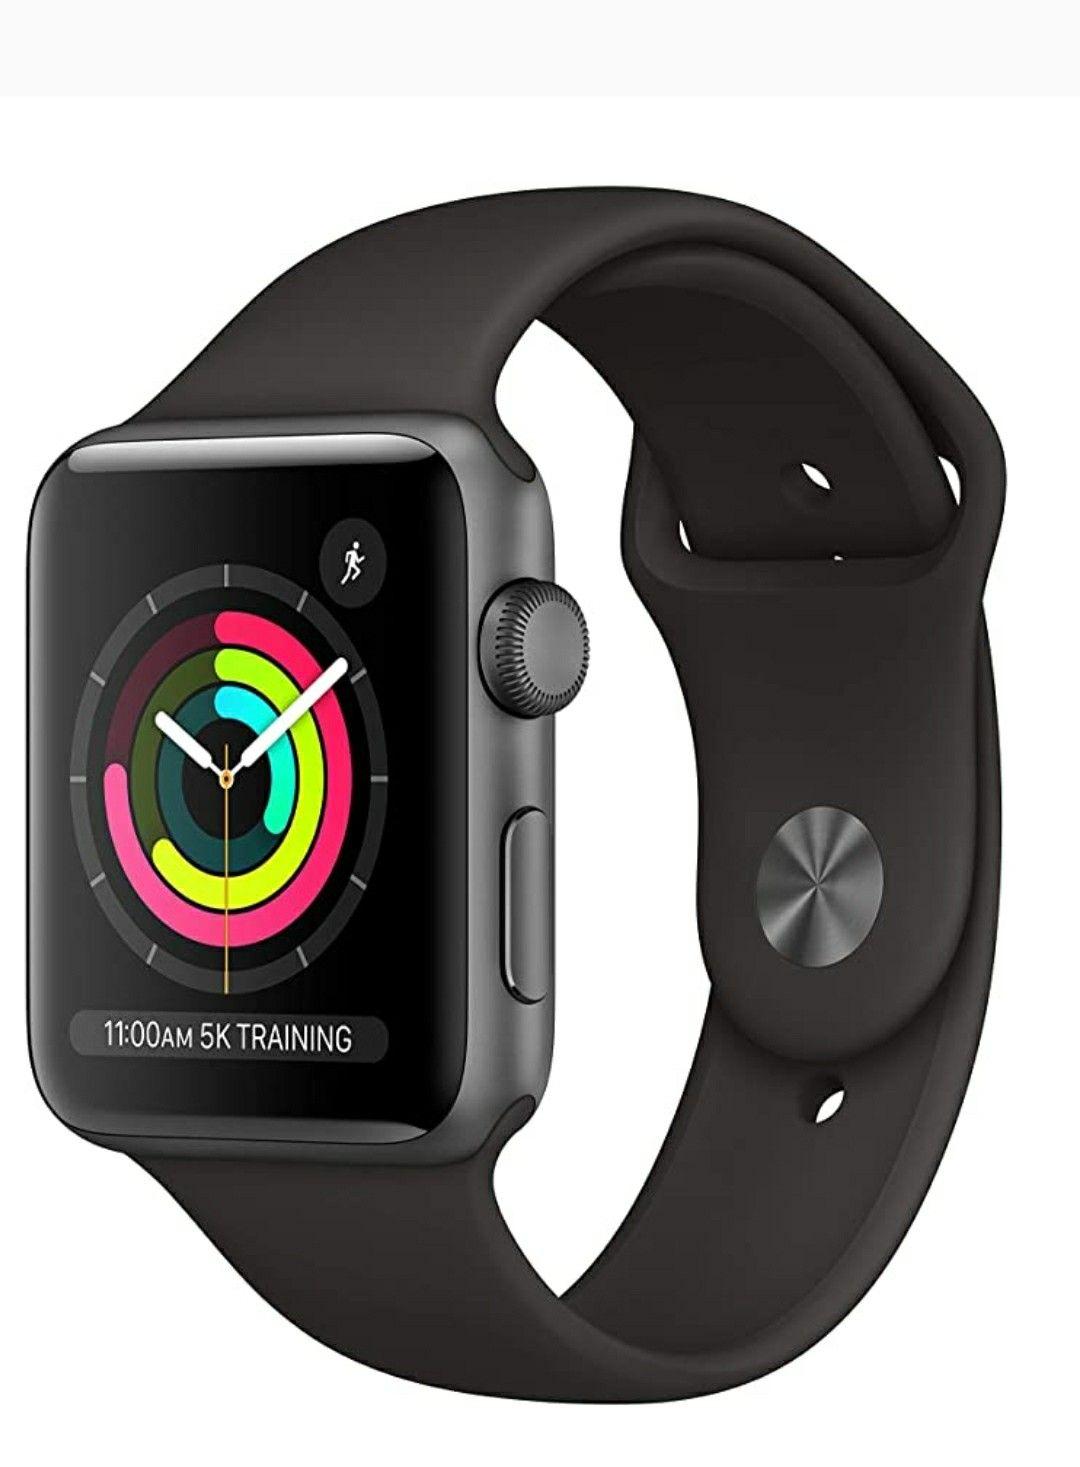 Apple Watch Series 3 (GPS, 42mm) Space Gray Aluminum